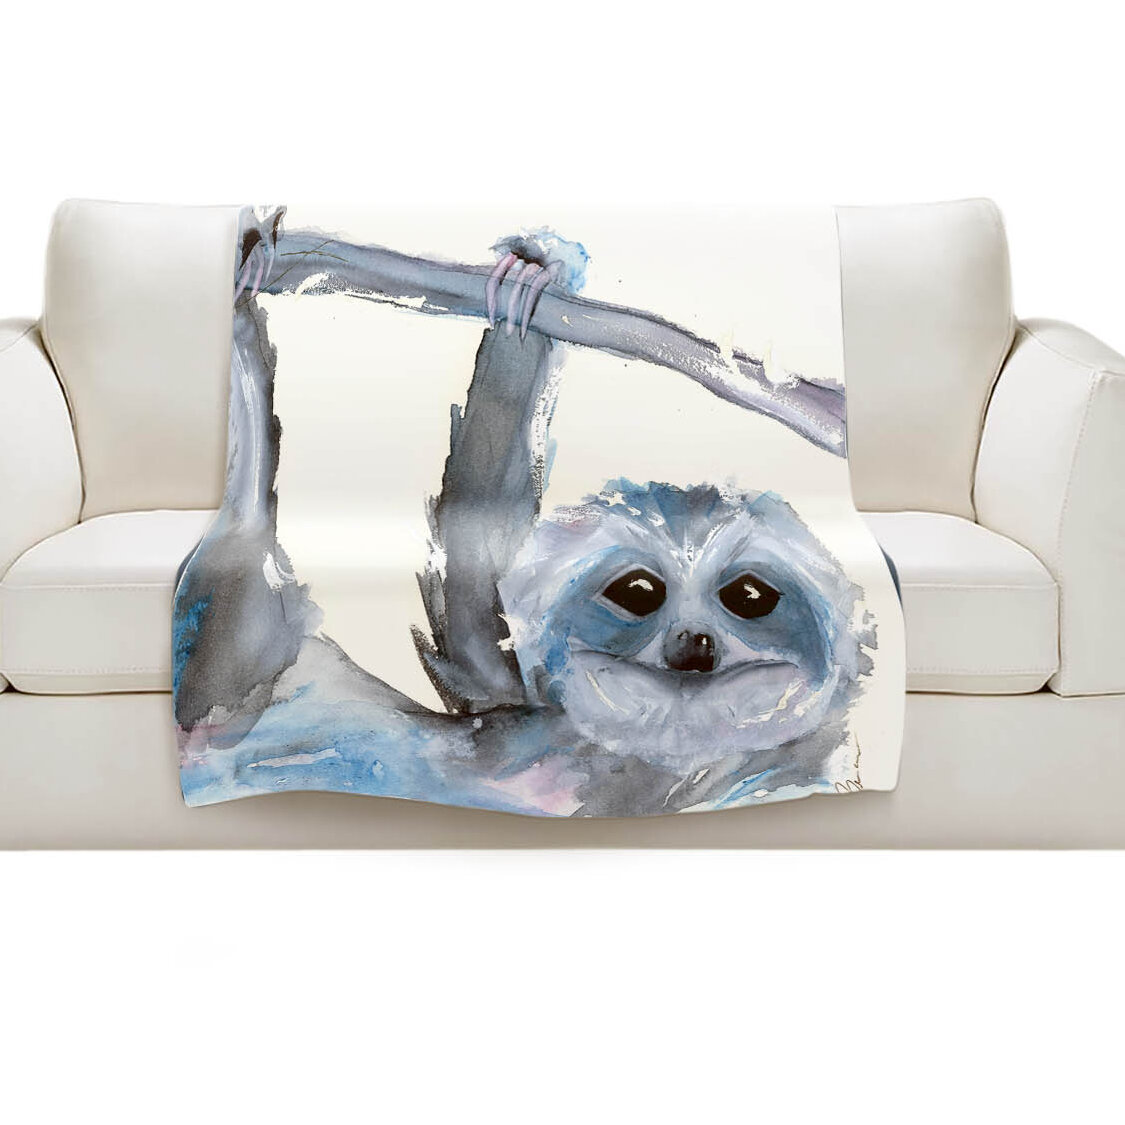 Blue Wildlife Blankets Throws You Ll Love In 2021 Wayfair